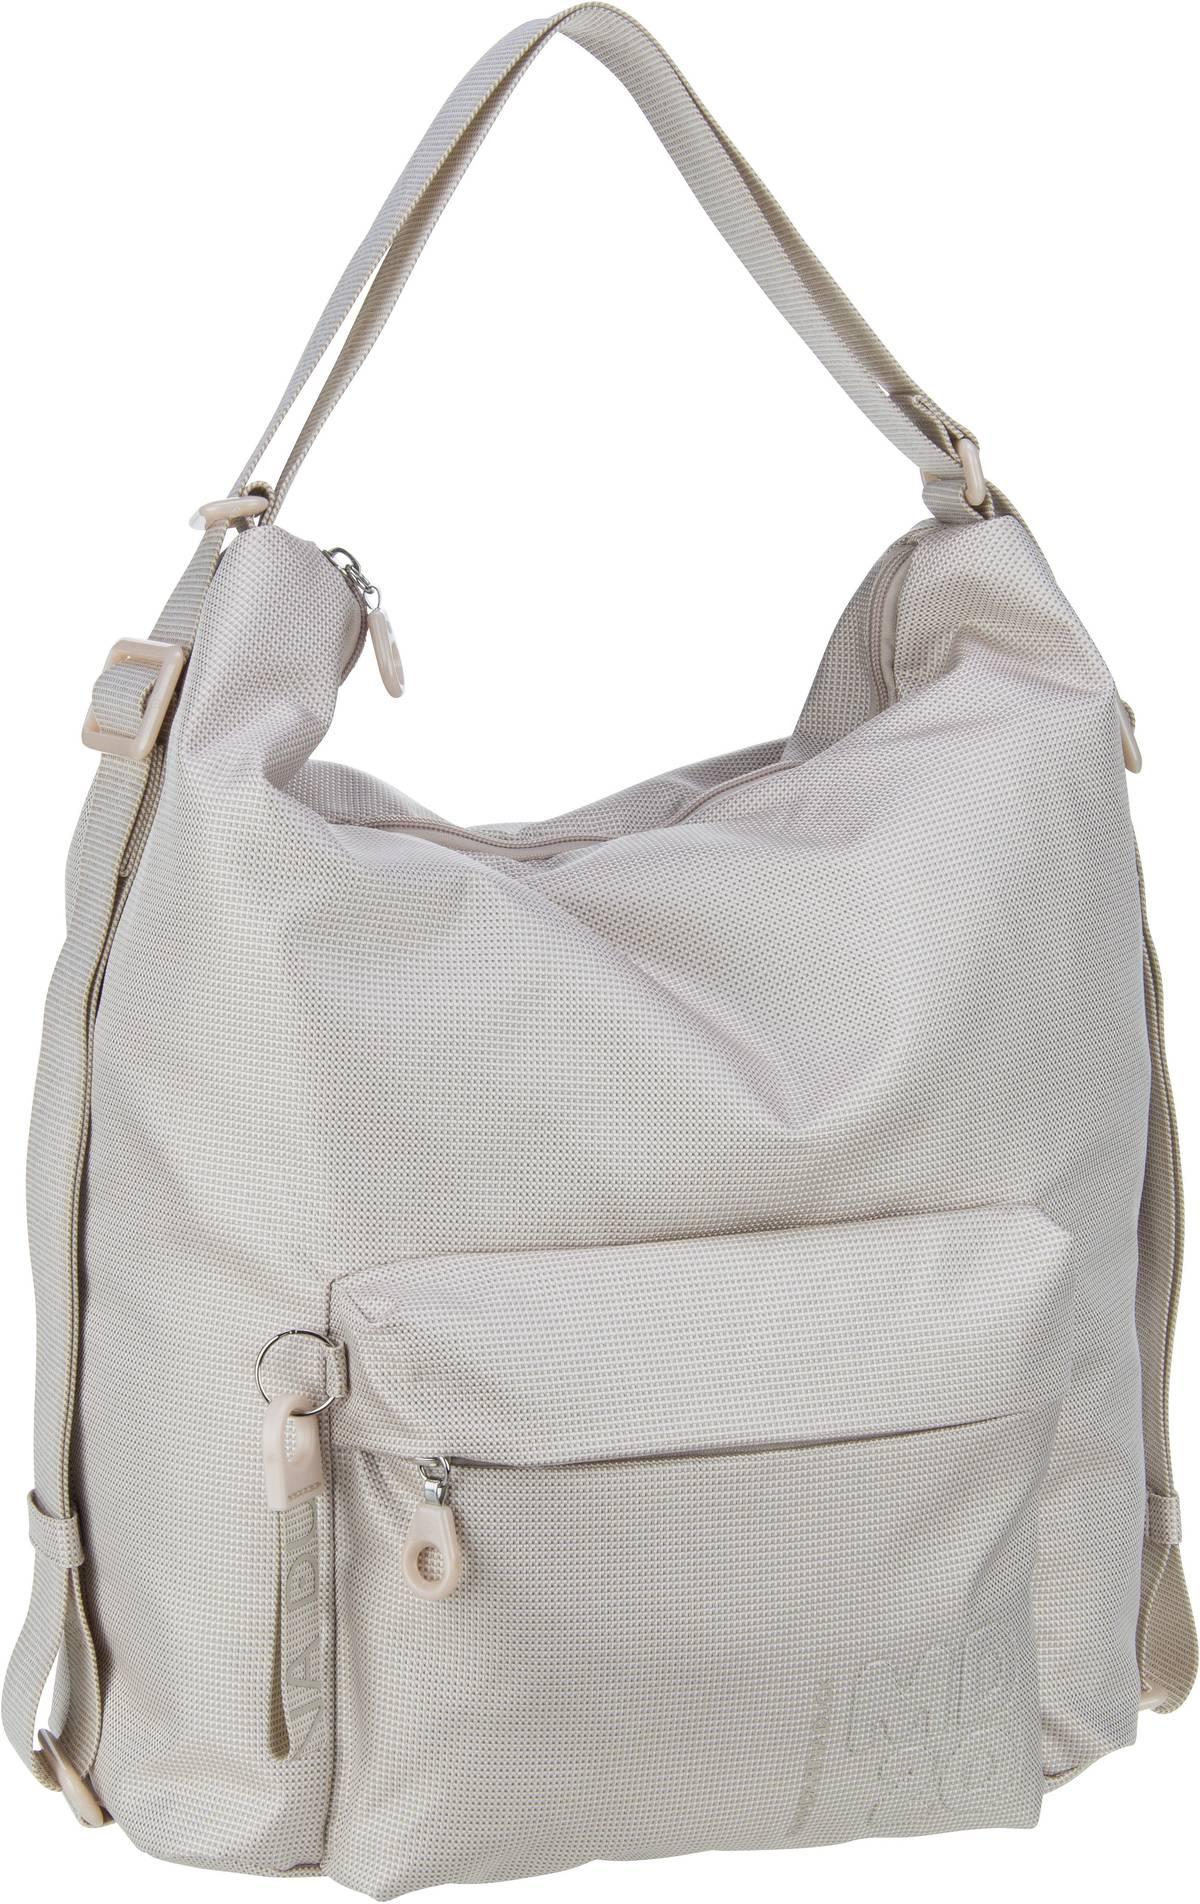 mandarina duck -  Handtasche MD20 Hobo Backpack QMT09 Off White